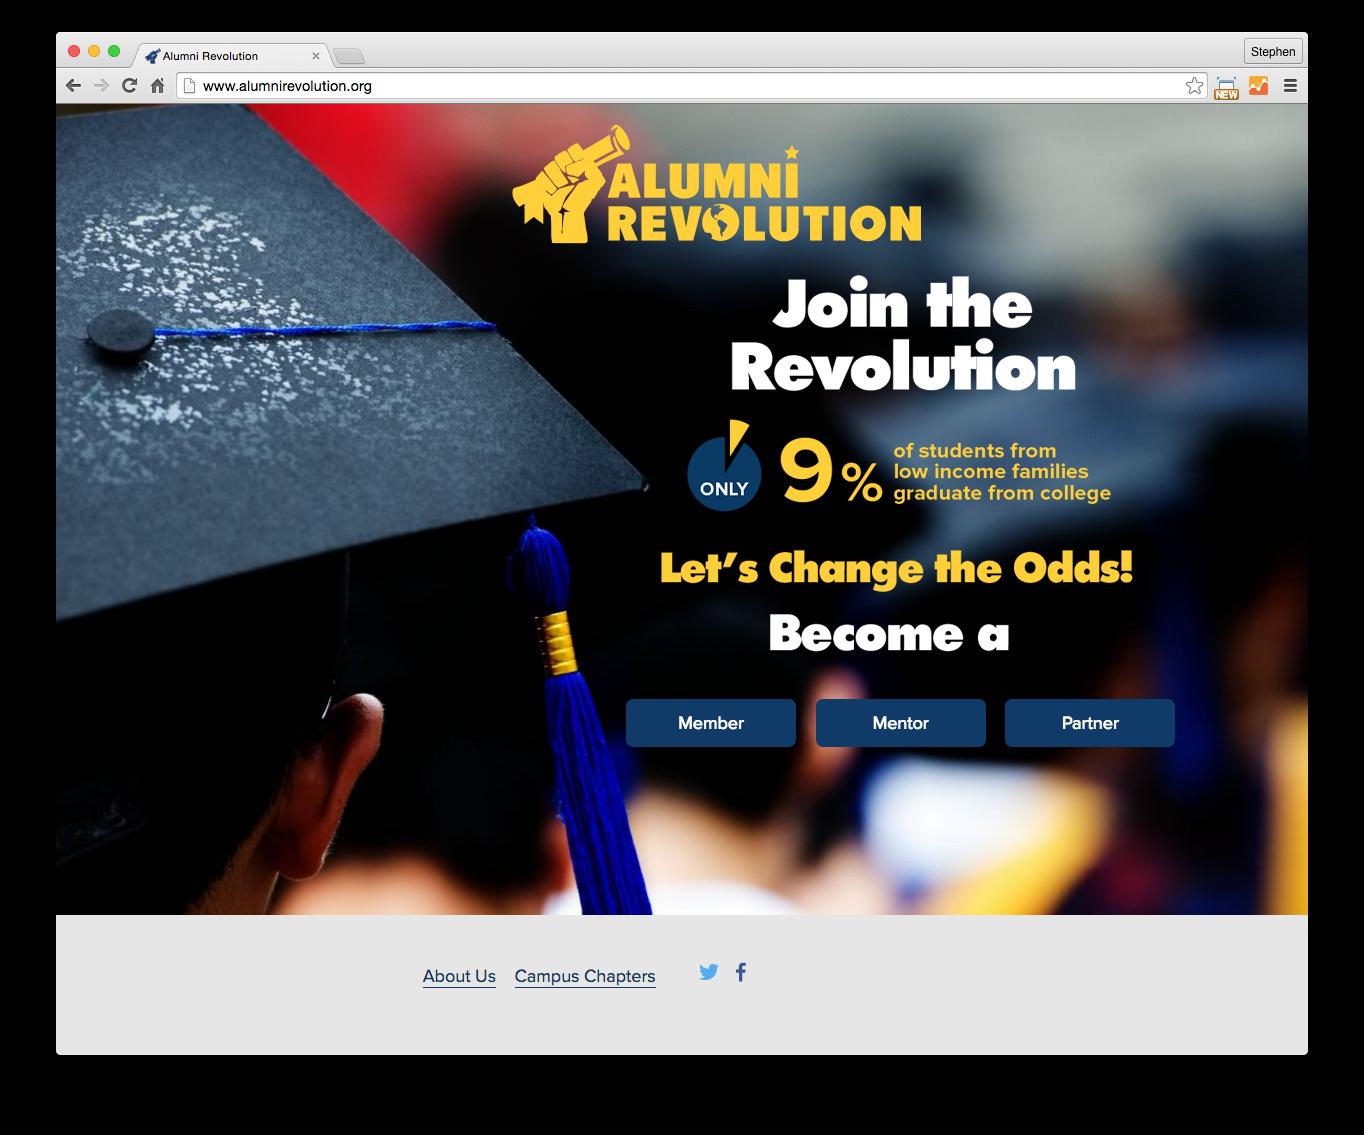 Alumni Revolution